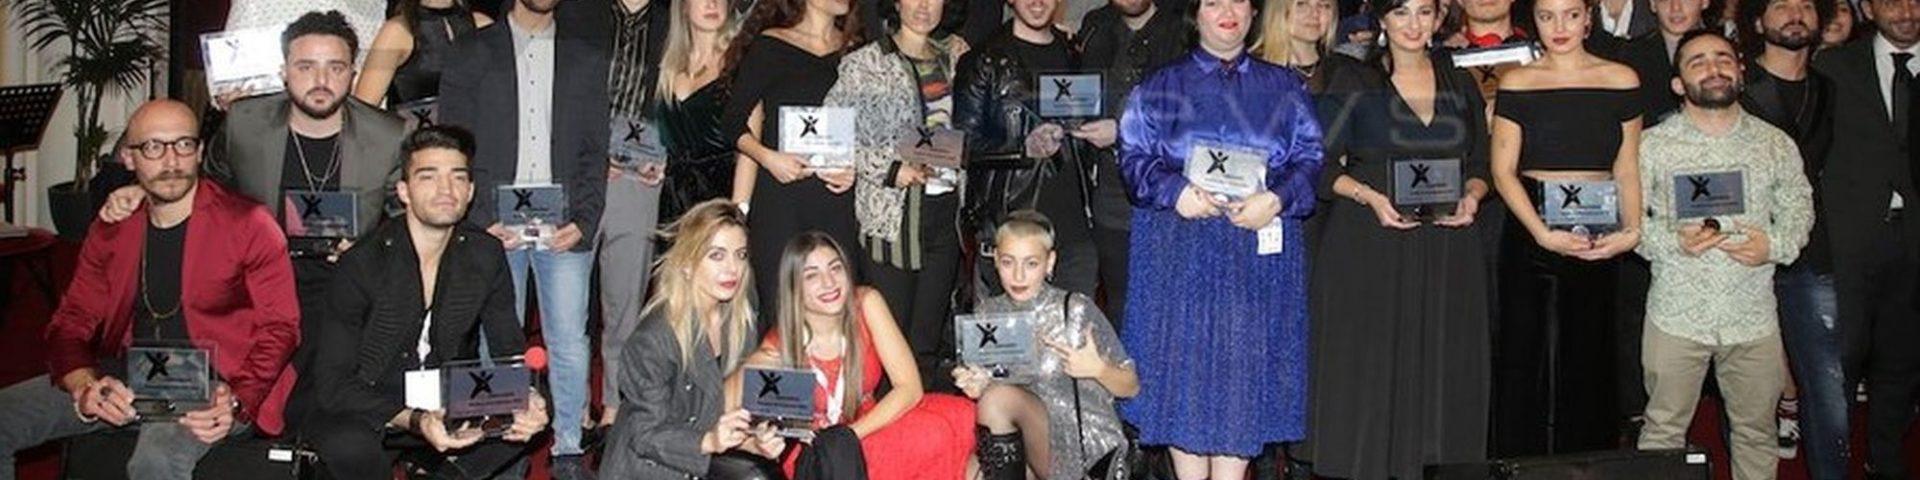 Area Sanremo Tim 2018: proclamati i 25 vincitori